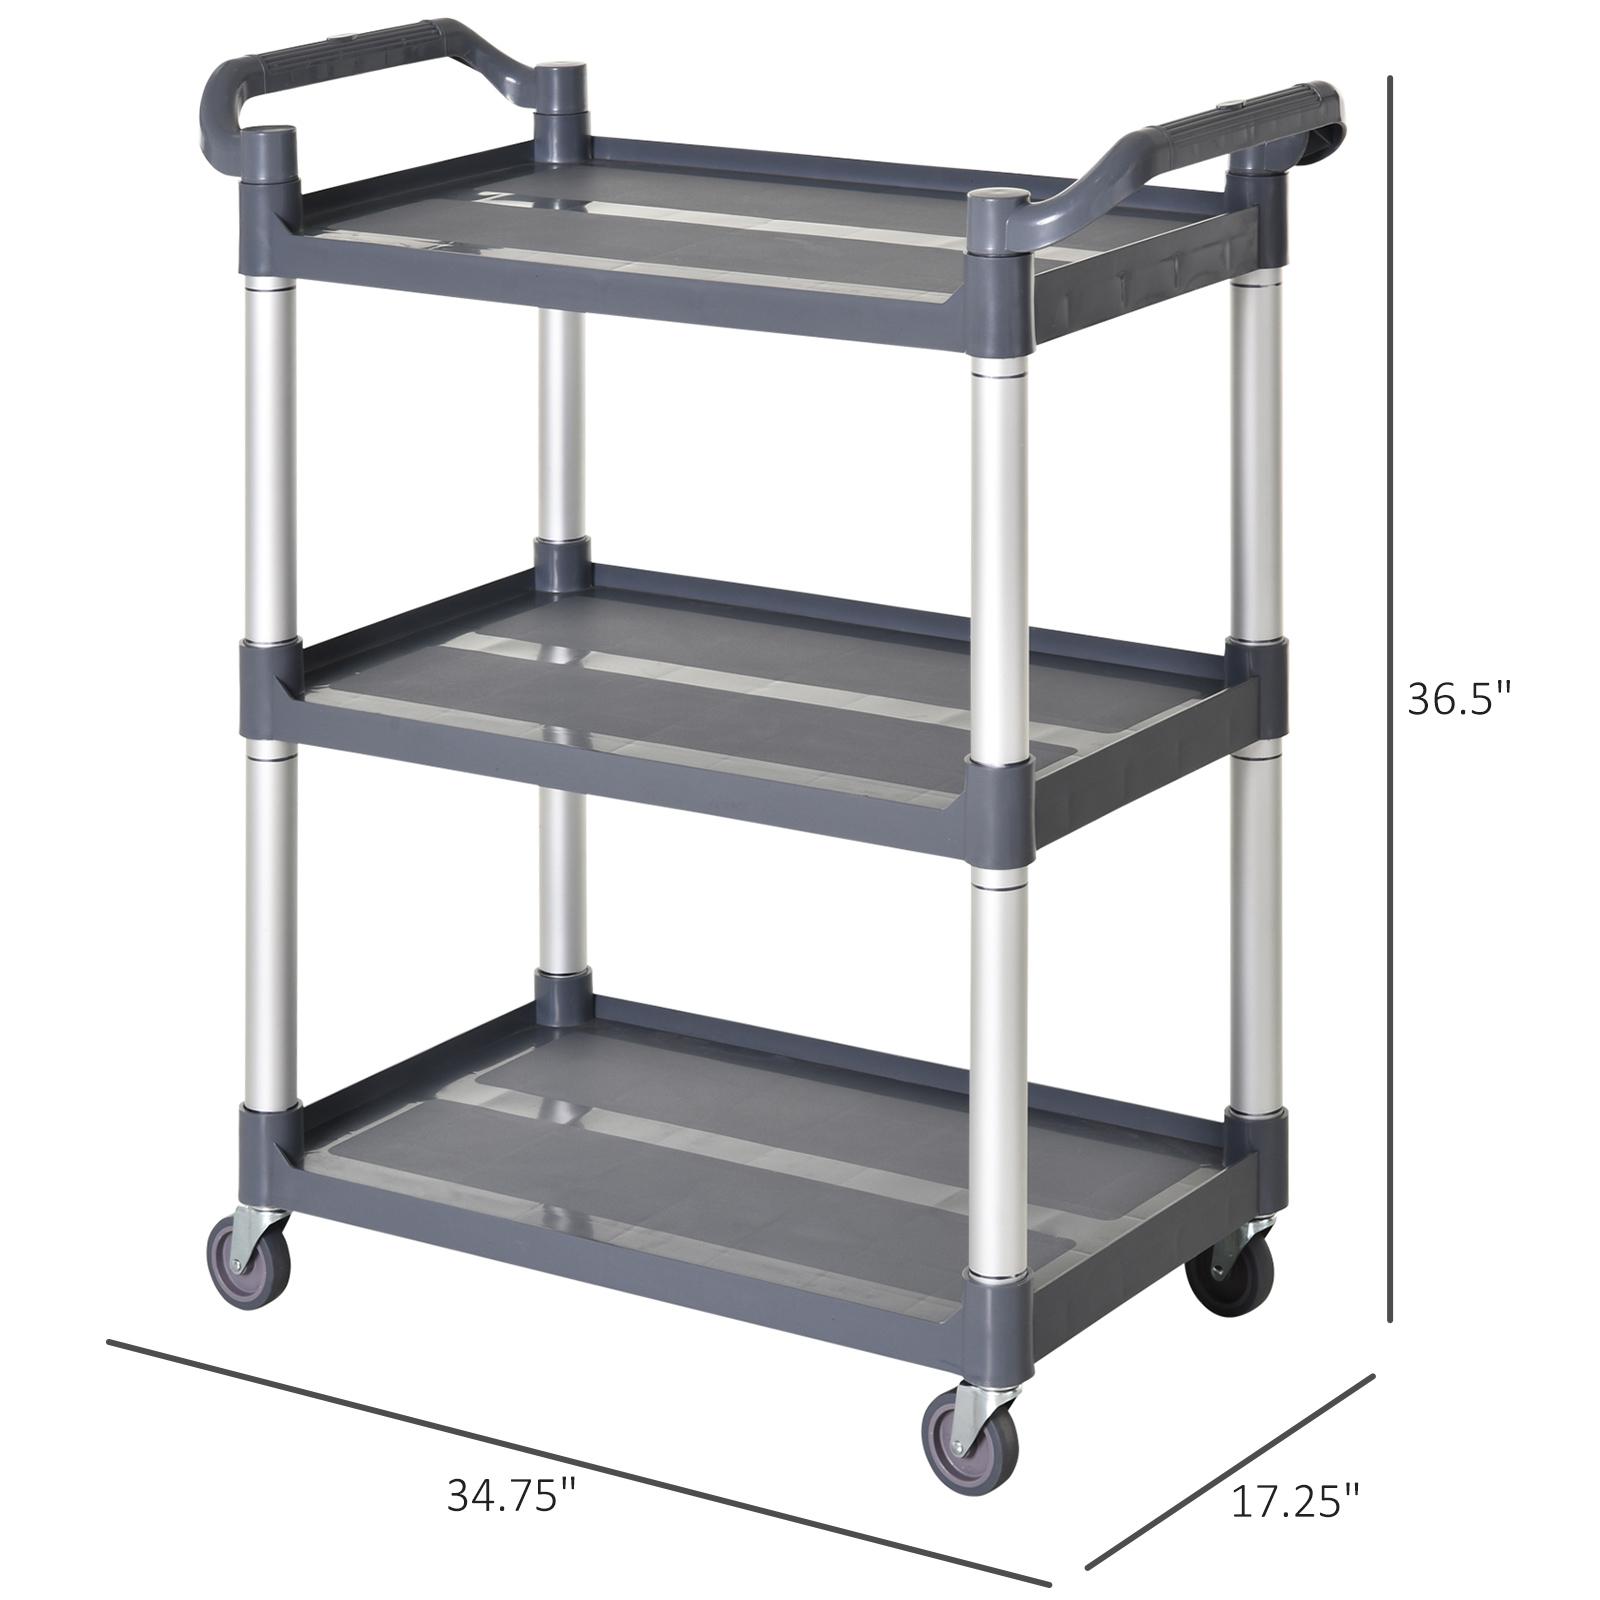 HOMCOM-3-Tier-Metal-Trolley-Serving-Cart-Free-Moving-Kitchen-Livingroom thumbnail 2